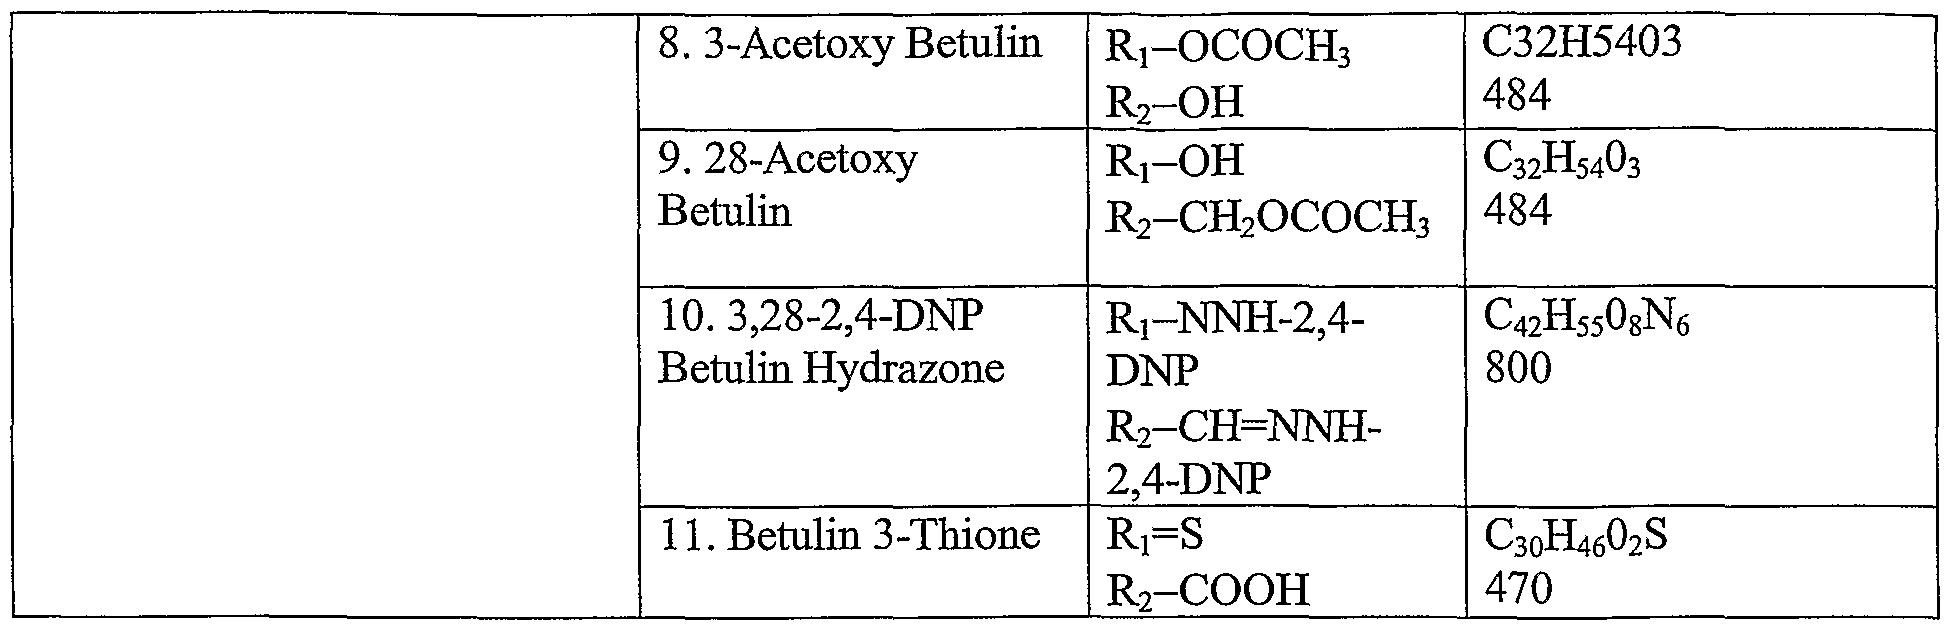 WO2006031756A2 - Betulinol derivatives as anti-cancer agents